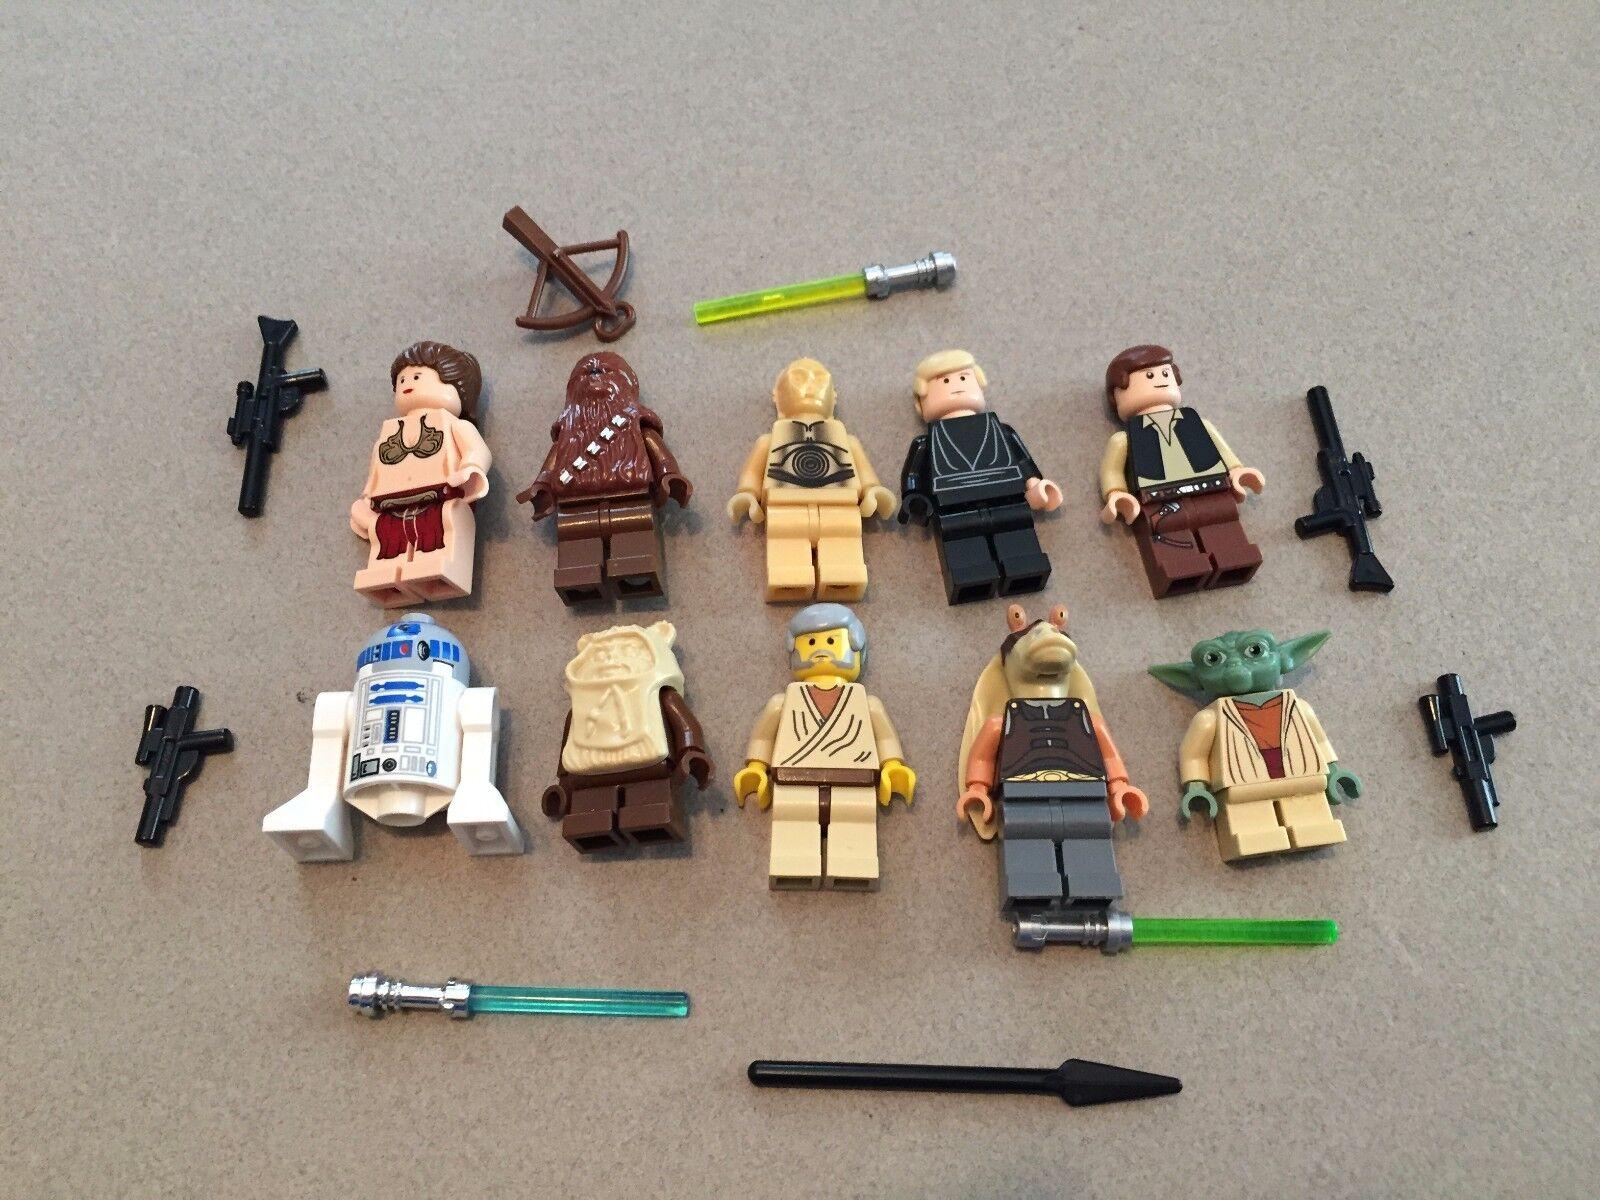 LEGO lot of 10 Star Wars Good Guy Minifigs Yoda Luke Leia Han R2-D2 Chewie N306